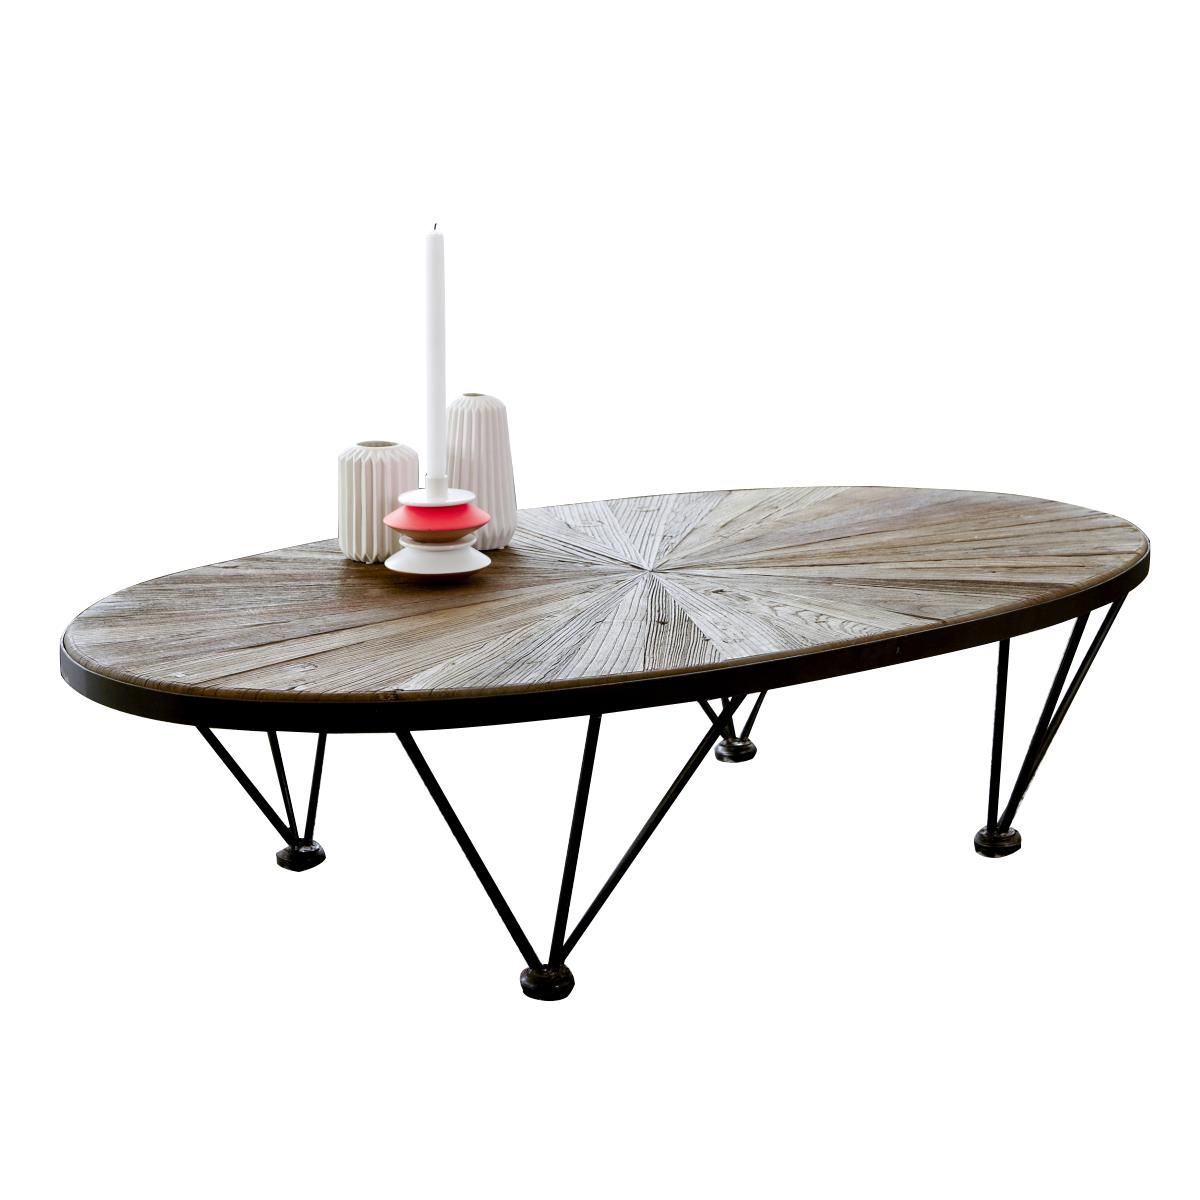 Métal LancelotHome En Orme 140x80 Table Basse Et 3F1JlKucT